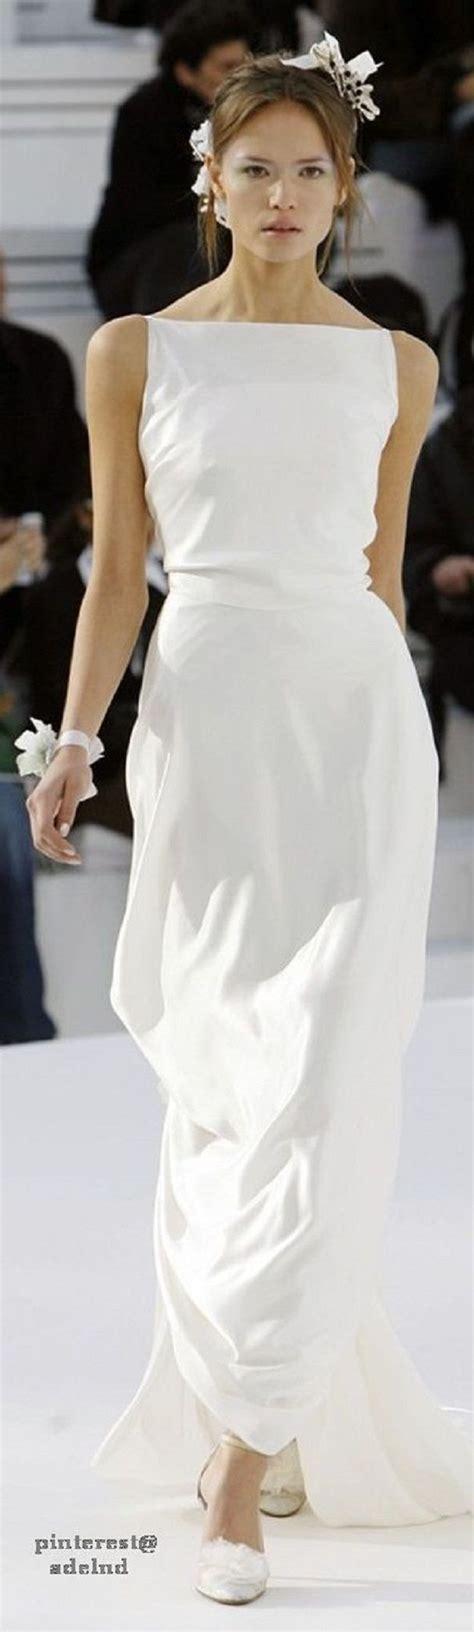 Dres Channel chanel wedding dresses 2014 www pixshark images